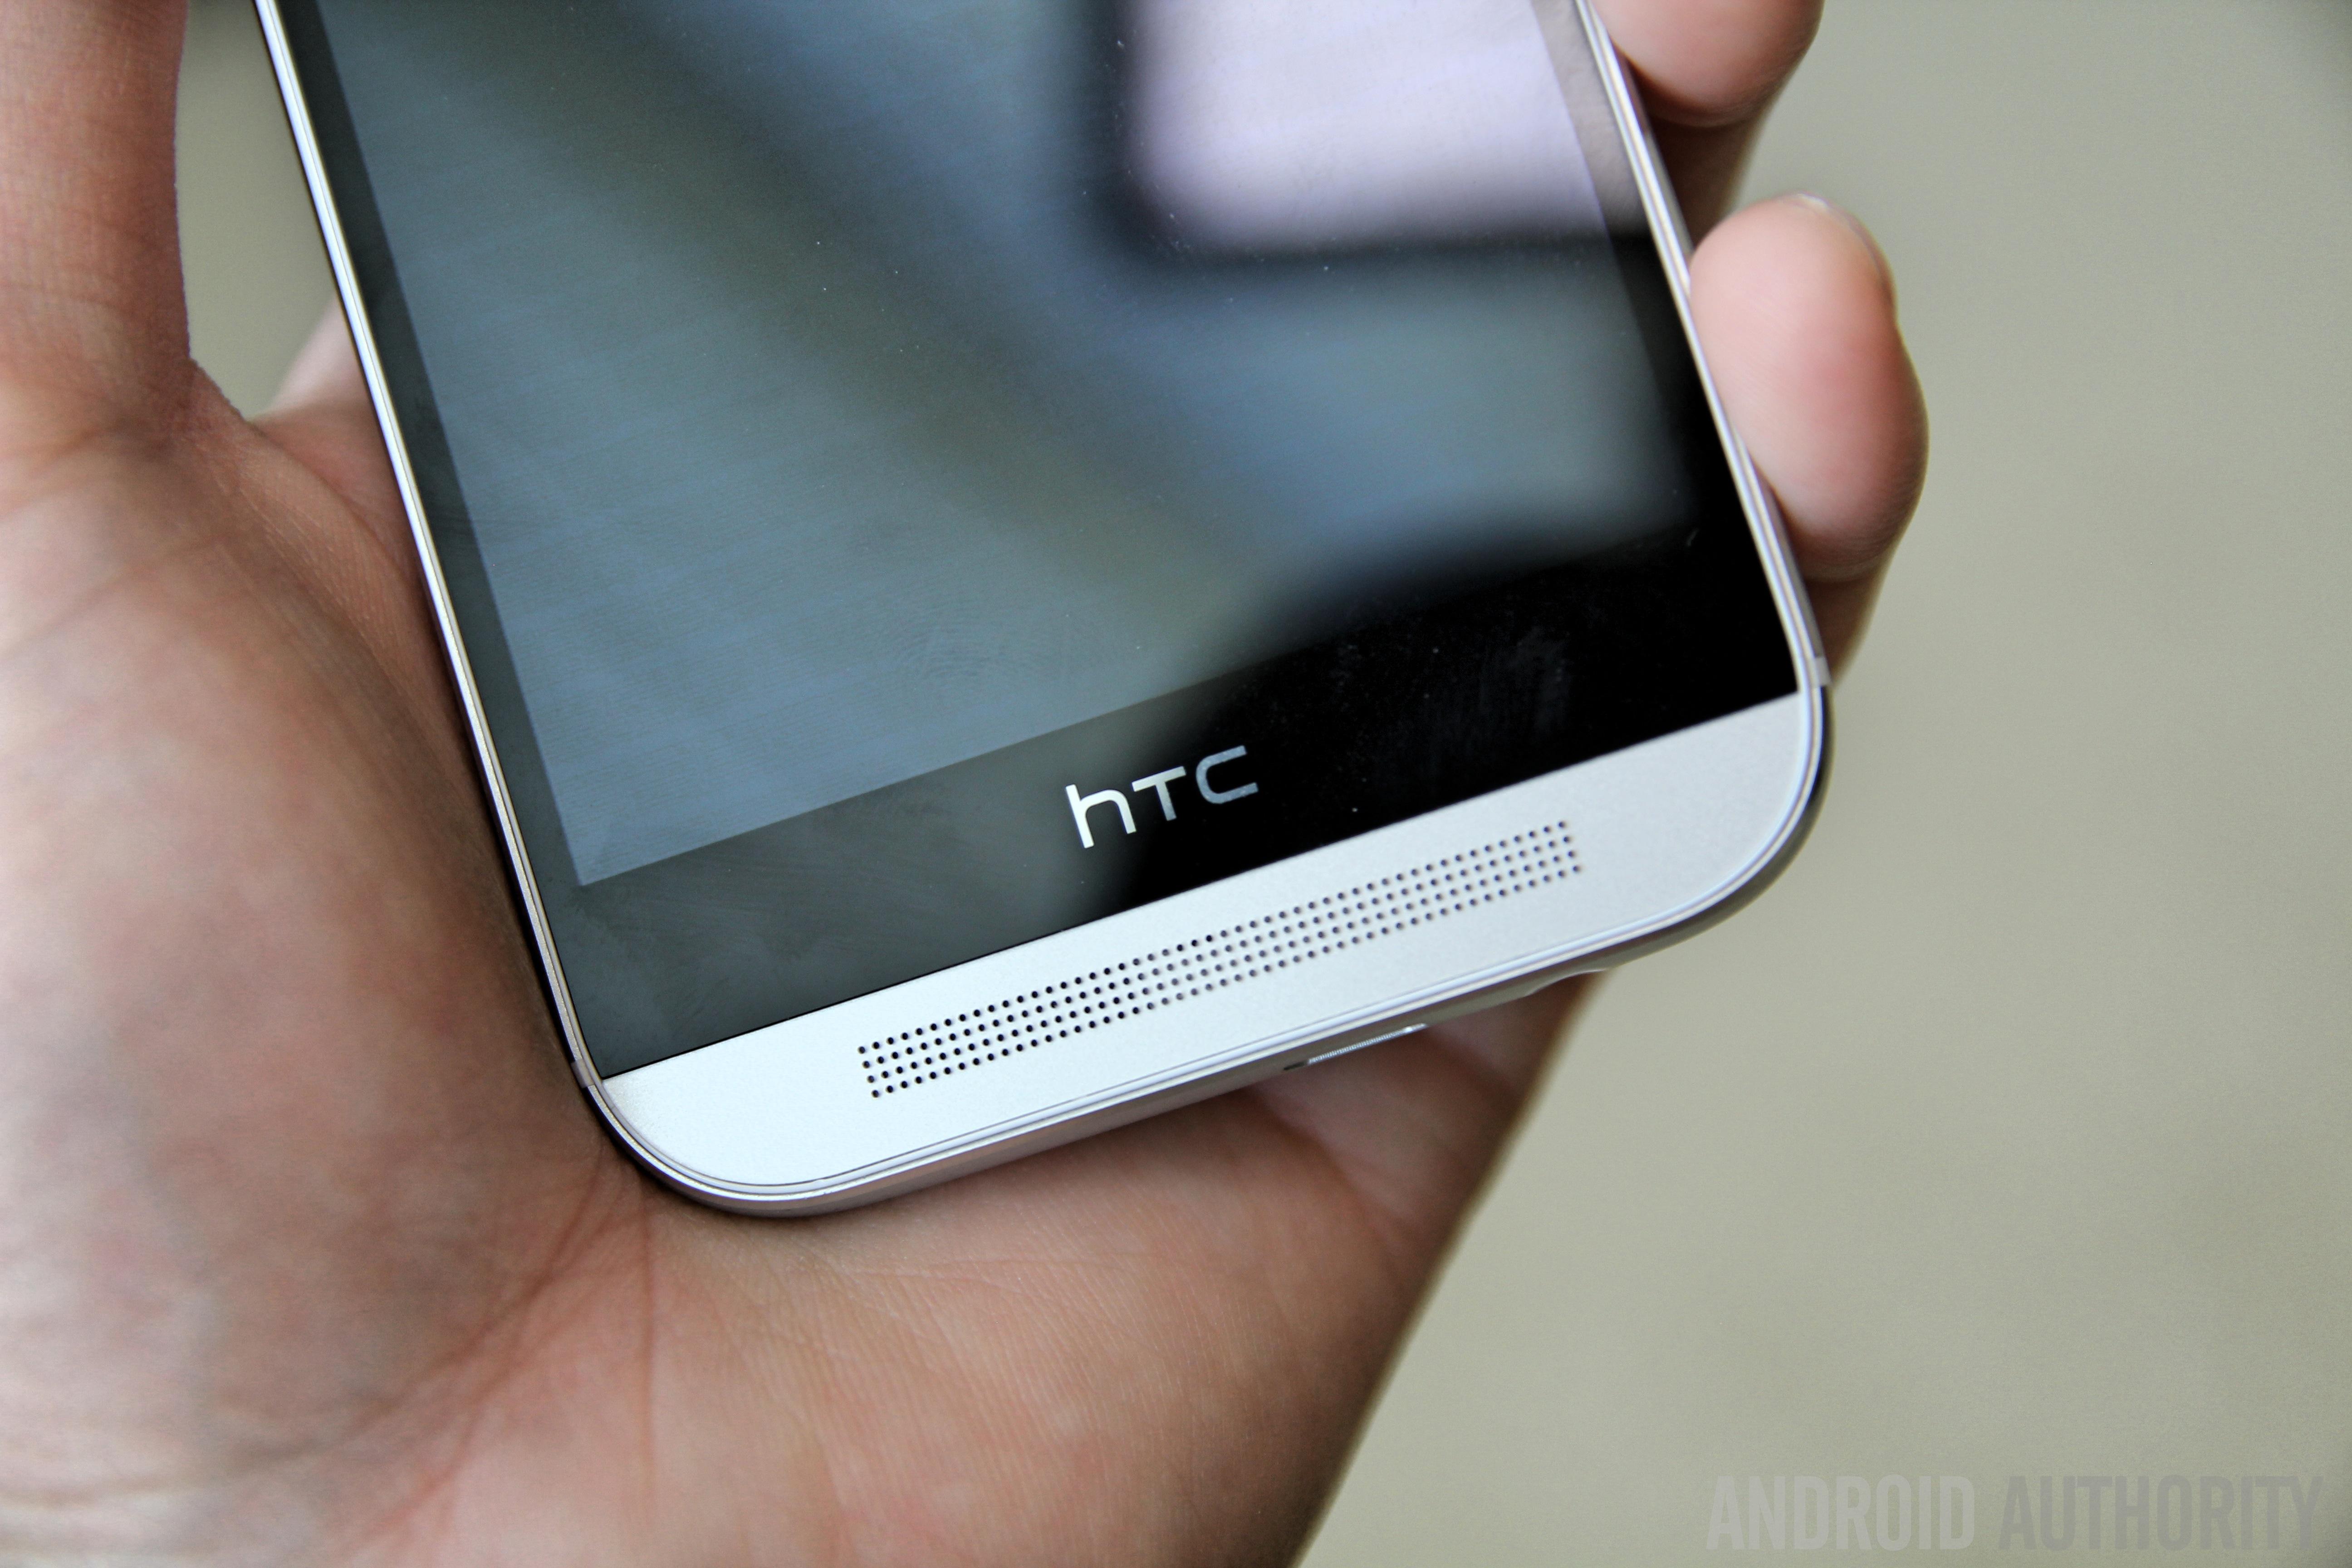 LG G3 Vs HTC One M8-13